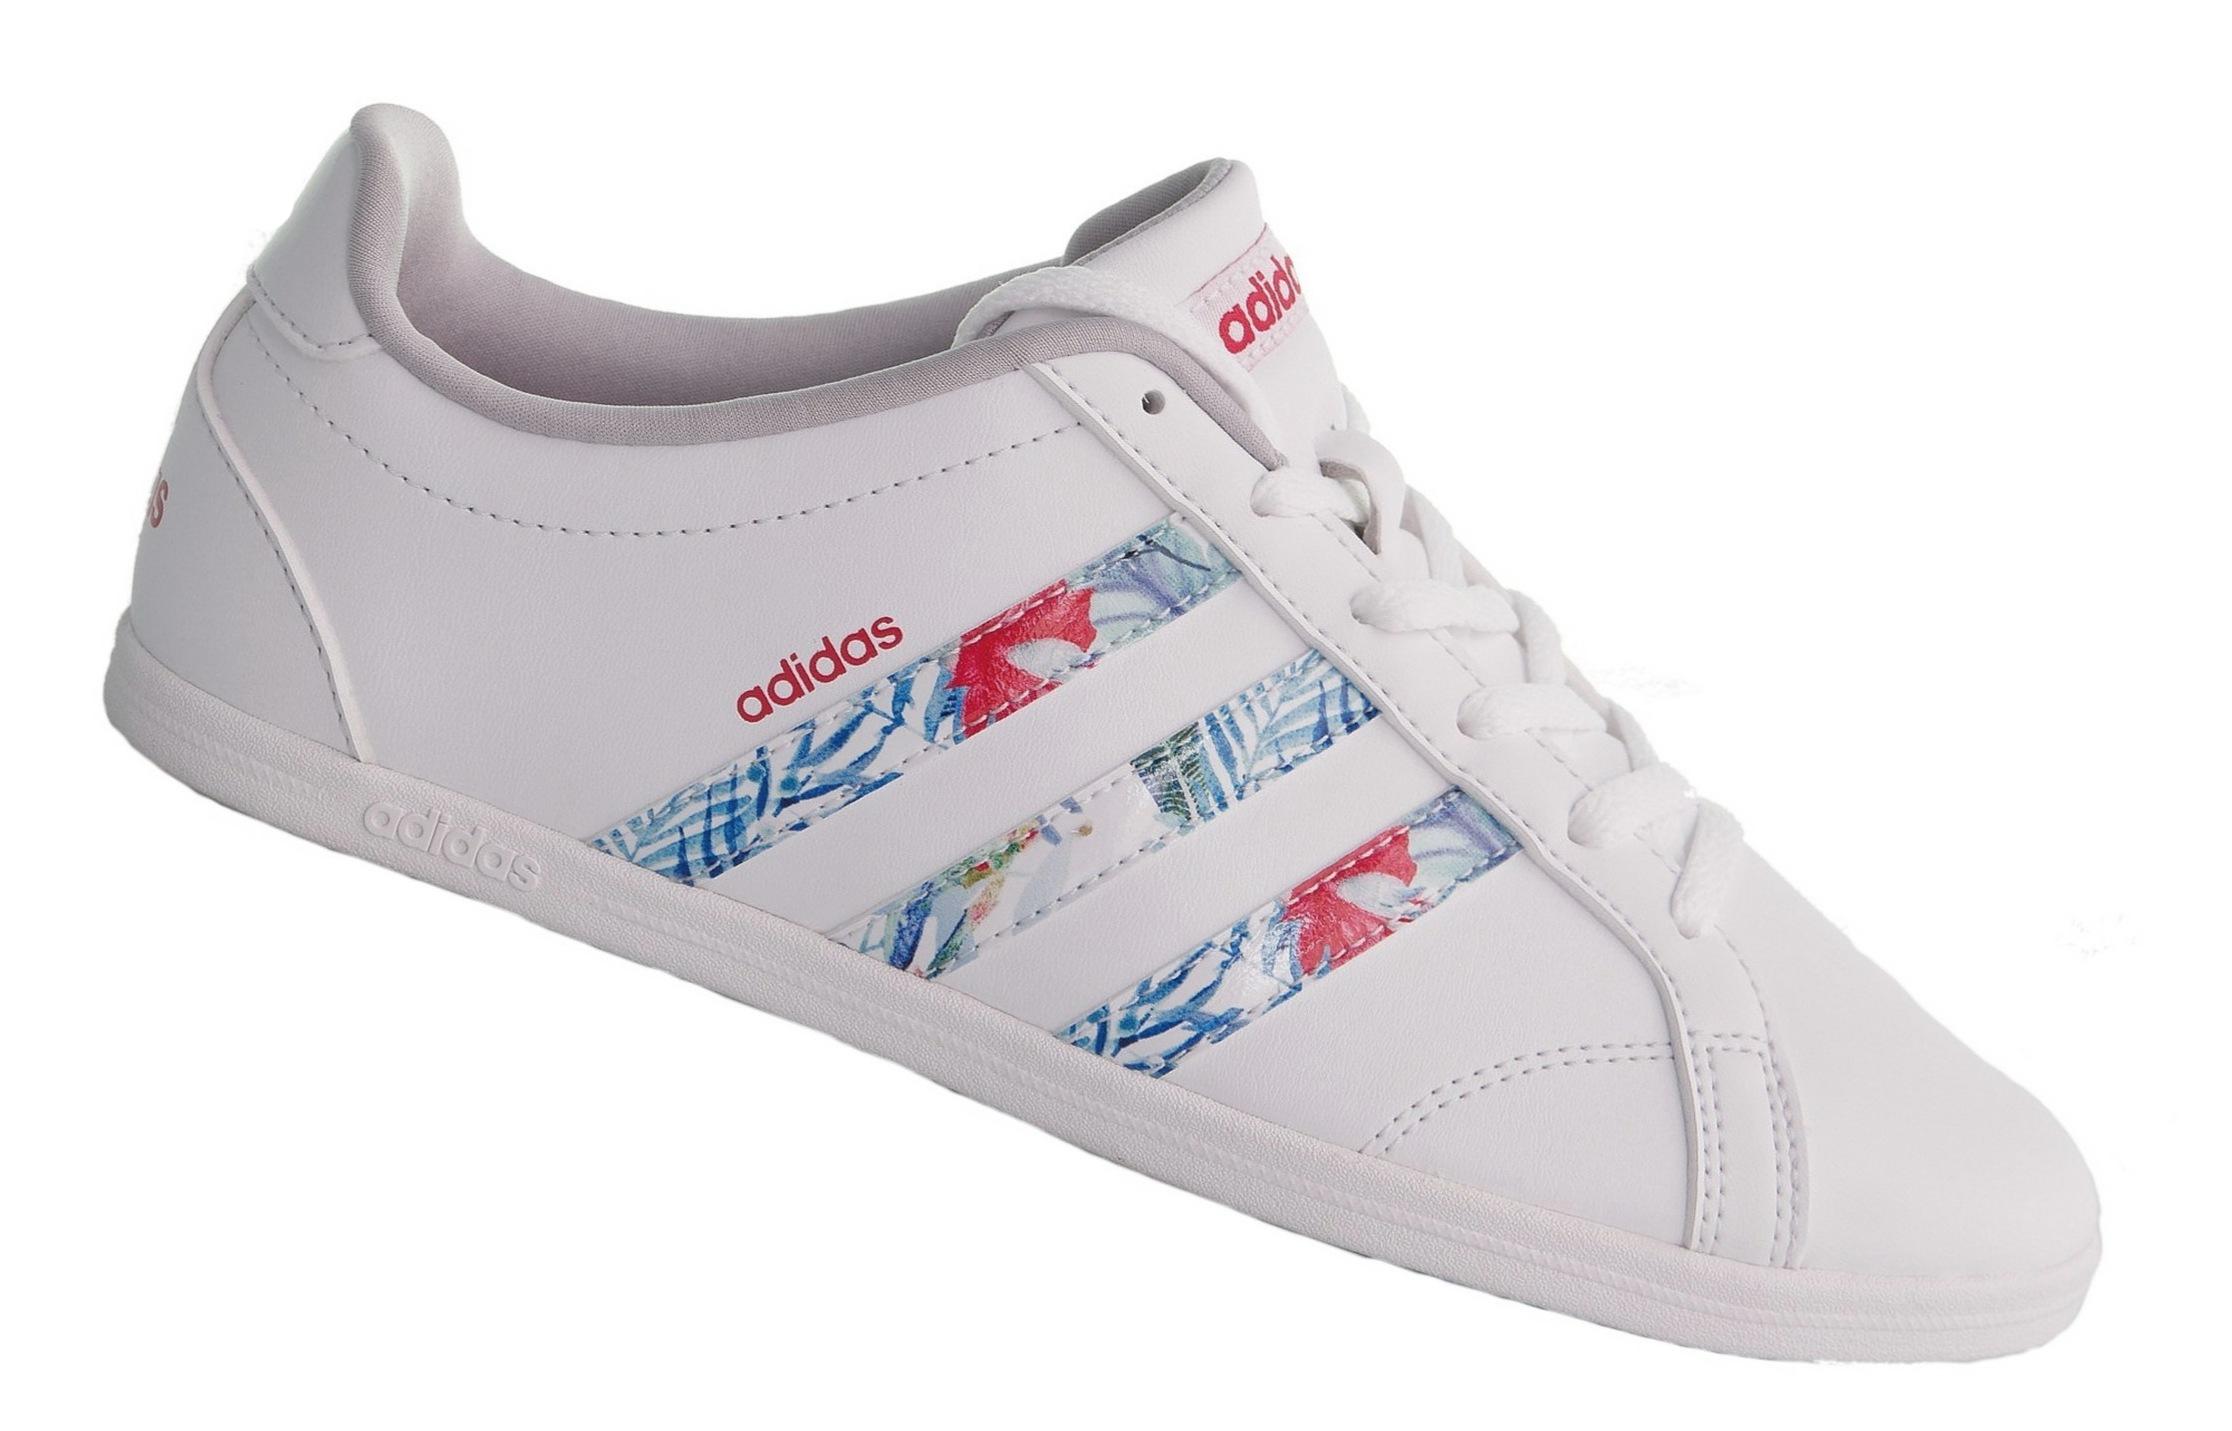 low priced 5e3ab bcccd adidas NEO VS CONEO QT W CG5759 rozmiar 37,3